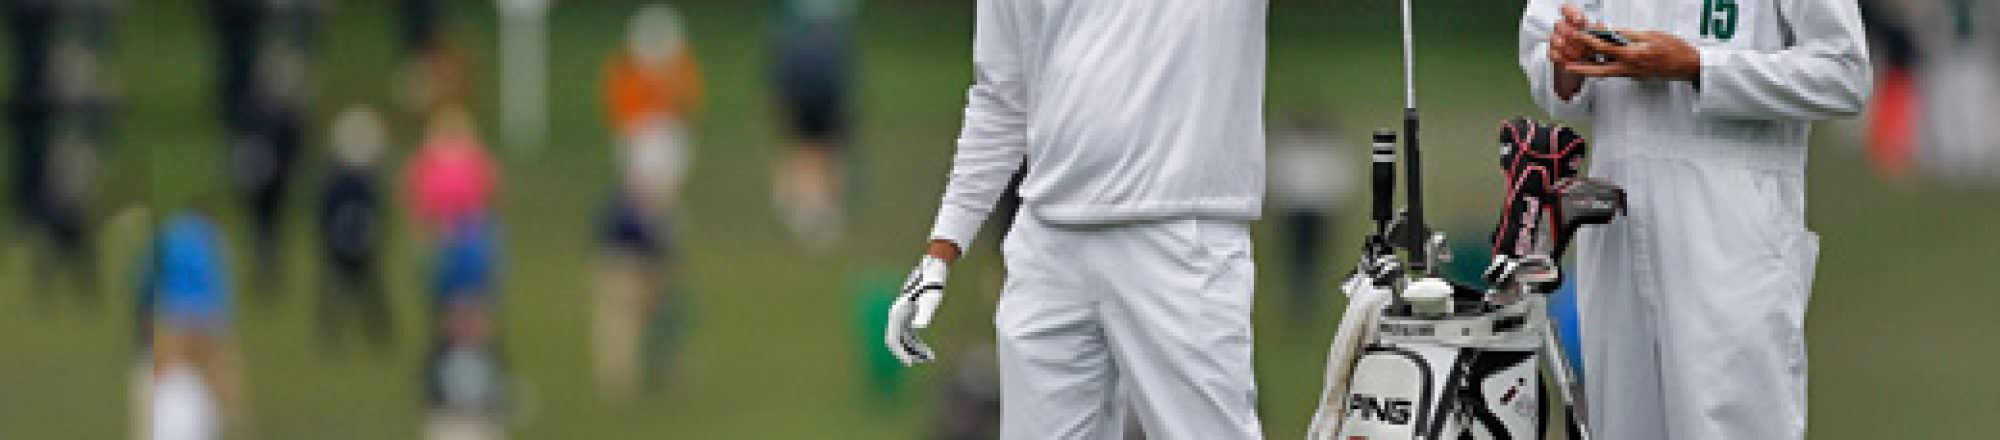 Masters 2012: In the winner's bag